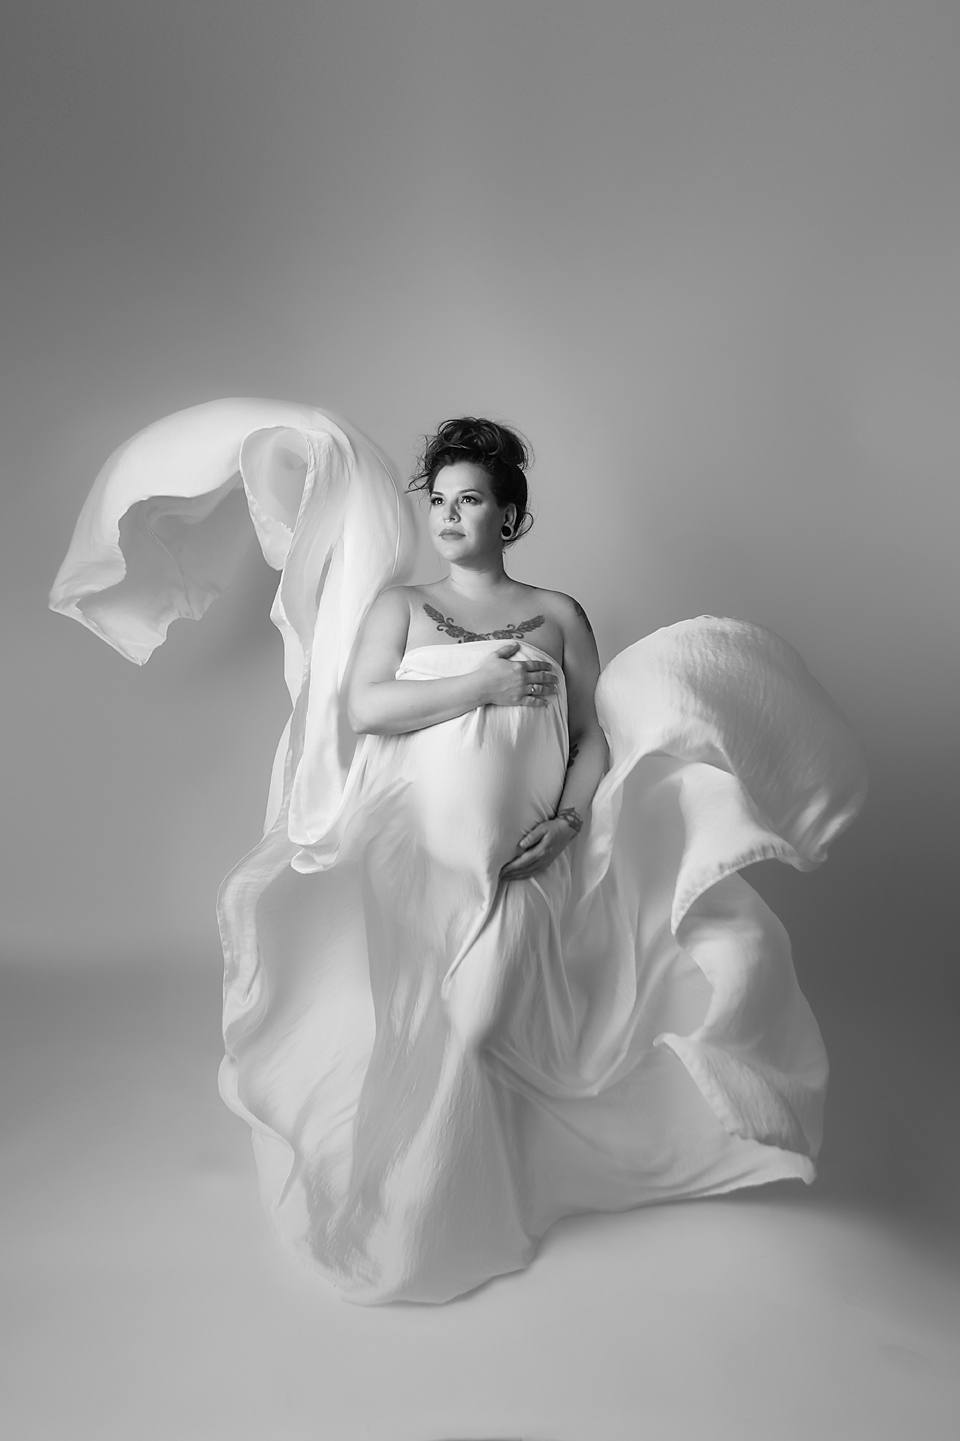 orange-county-maternity-photohraphy-studio-los-angeles-fabric-toss-silk-fashion-fine-art.jpg